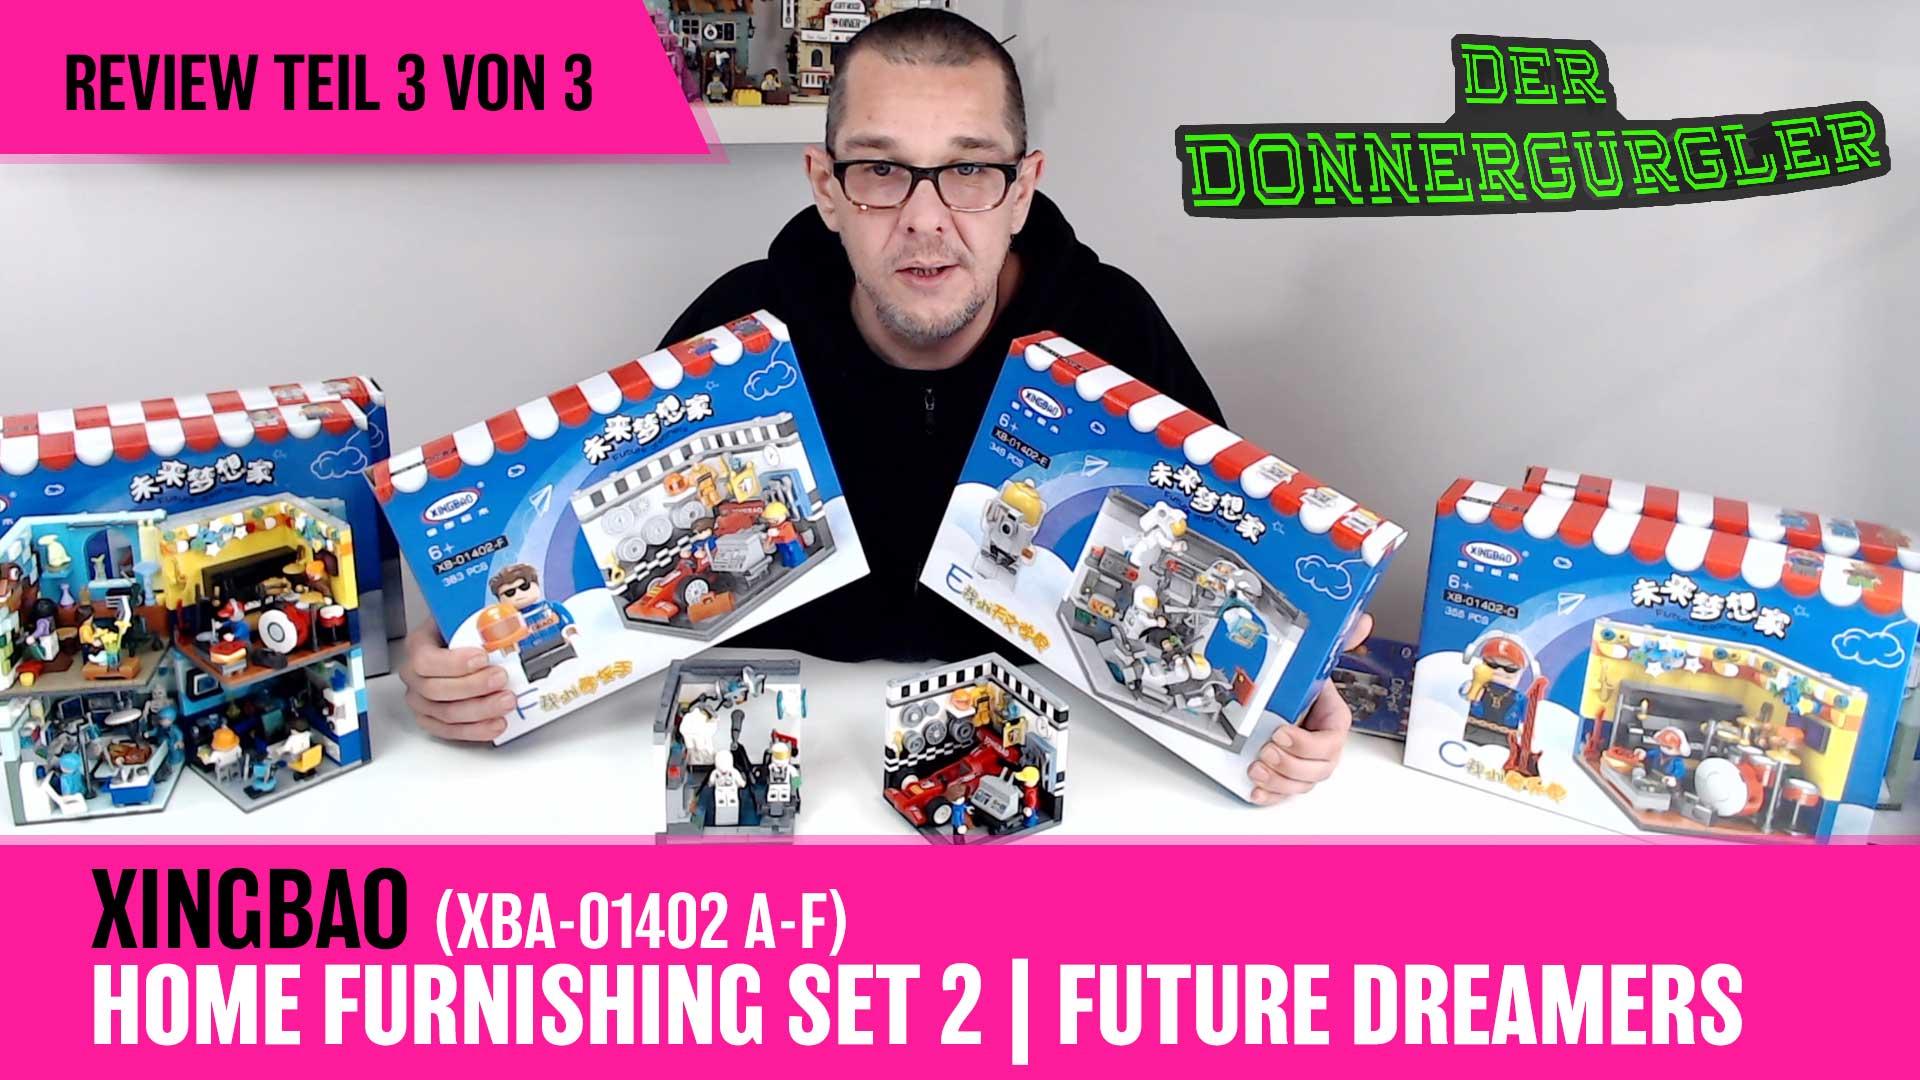 Xingbao Home Furnishing Set 2 - Future Dreamers Kompletset XBA-01402A-F Teil 3v3